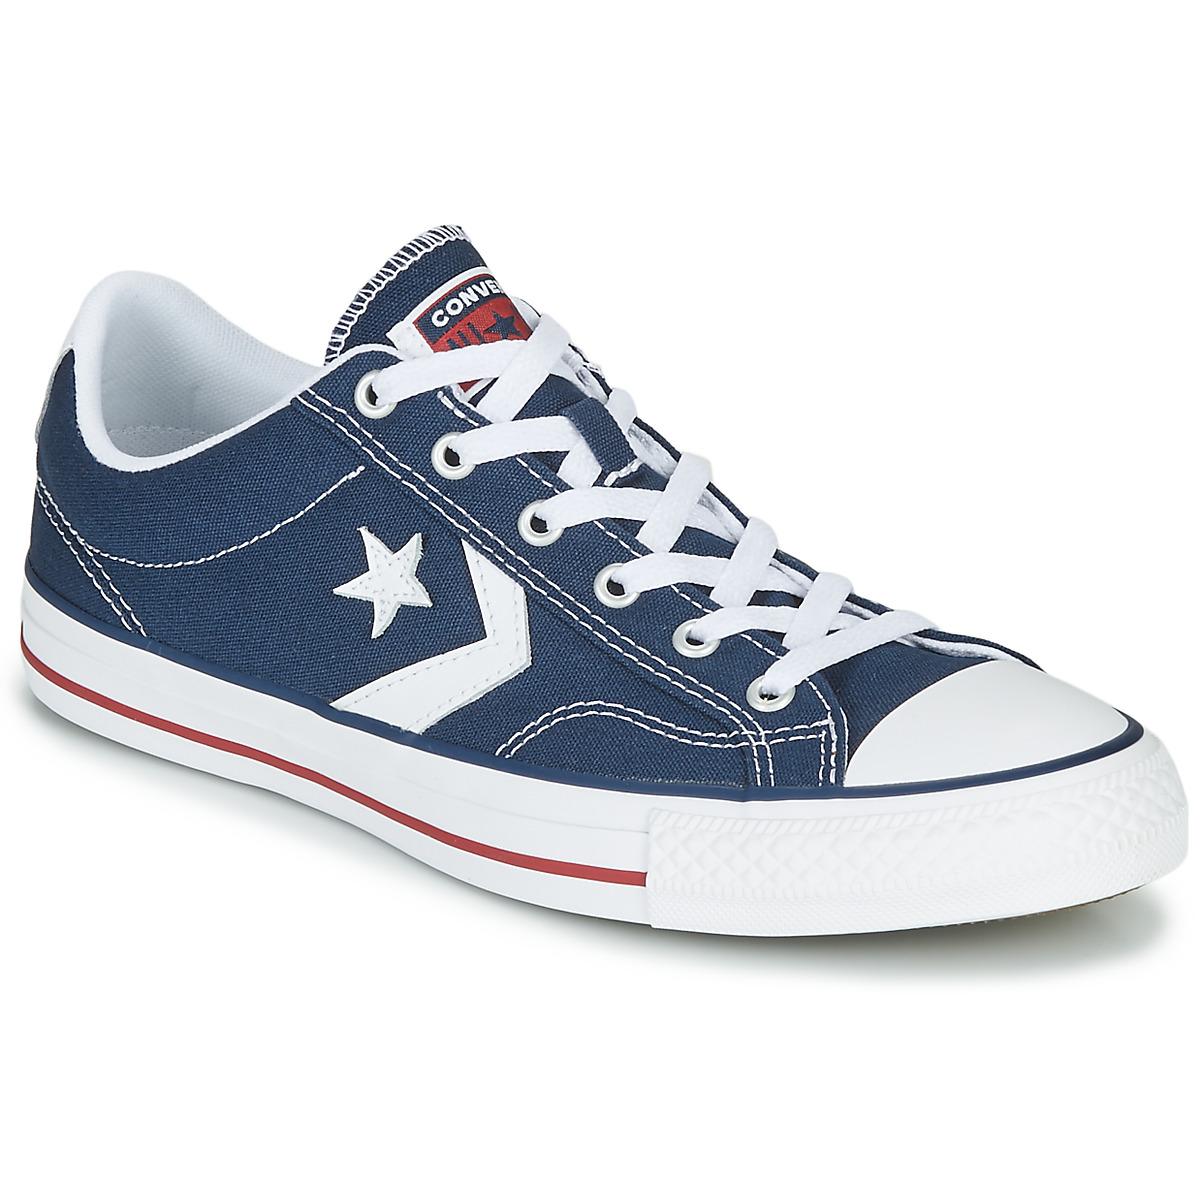 Converse STAR PLAYER CORE CANVAS OX Marine / Weiss - Kostenloser Versand bei Spartoode ! - Schuhe Sneaker Low  51,99 €